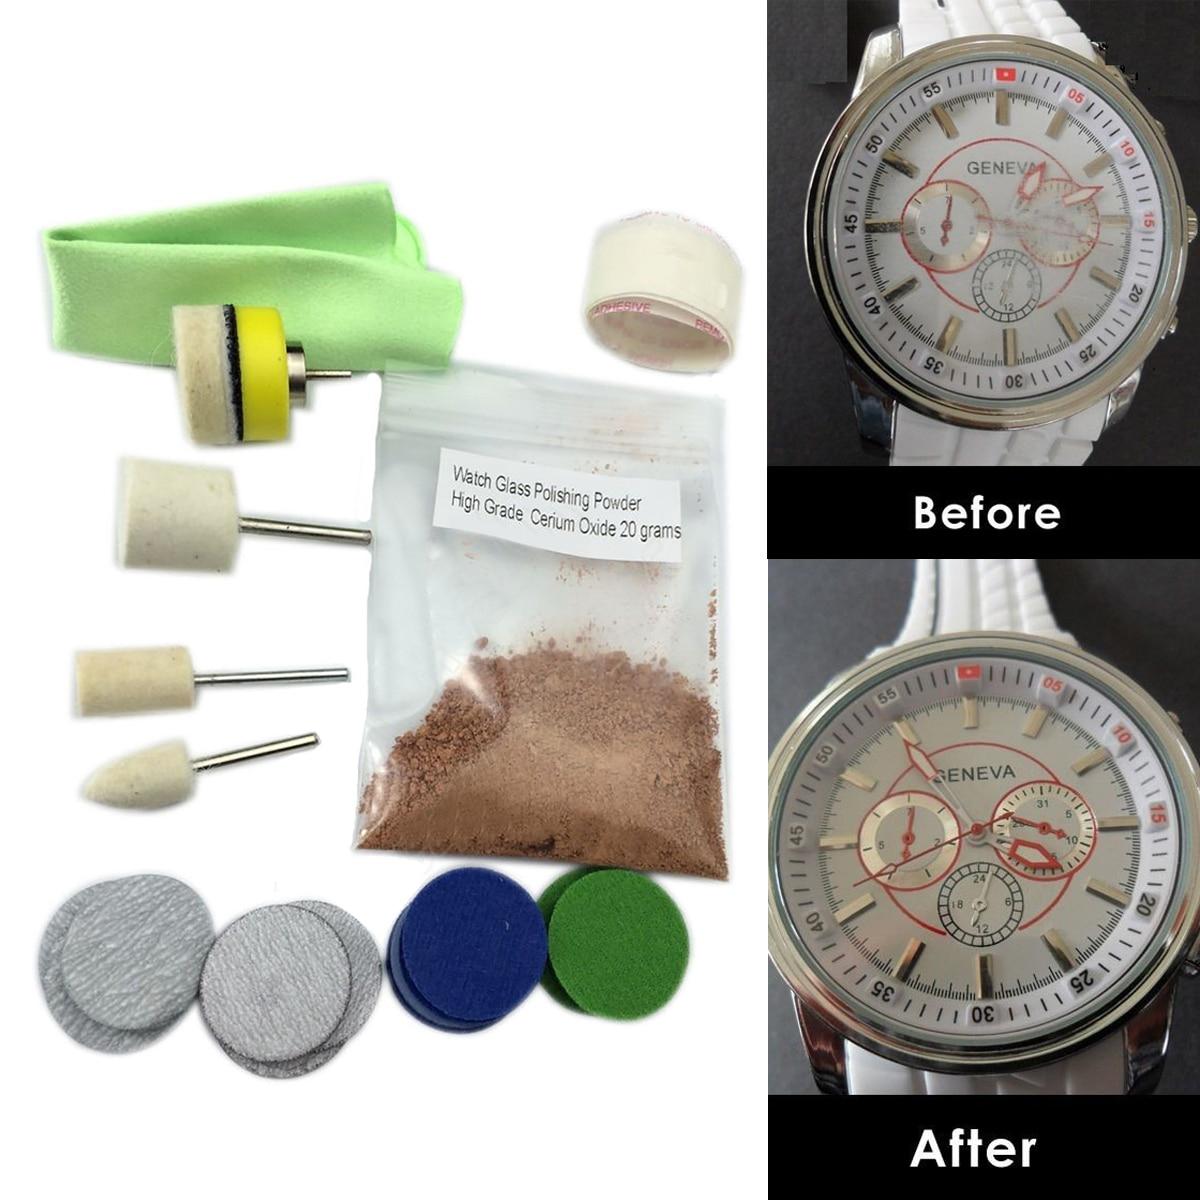 OSSIEAO New Watch Glass Polishing Kit Glass Scratch Removal Set Acrylic Sapphire Crystal